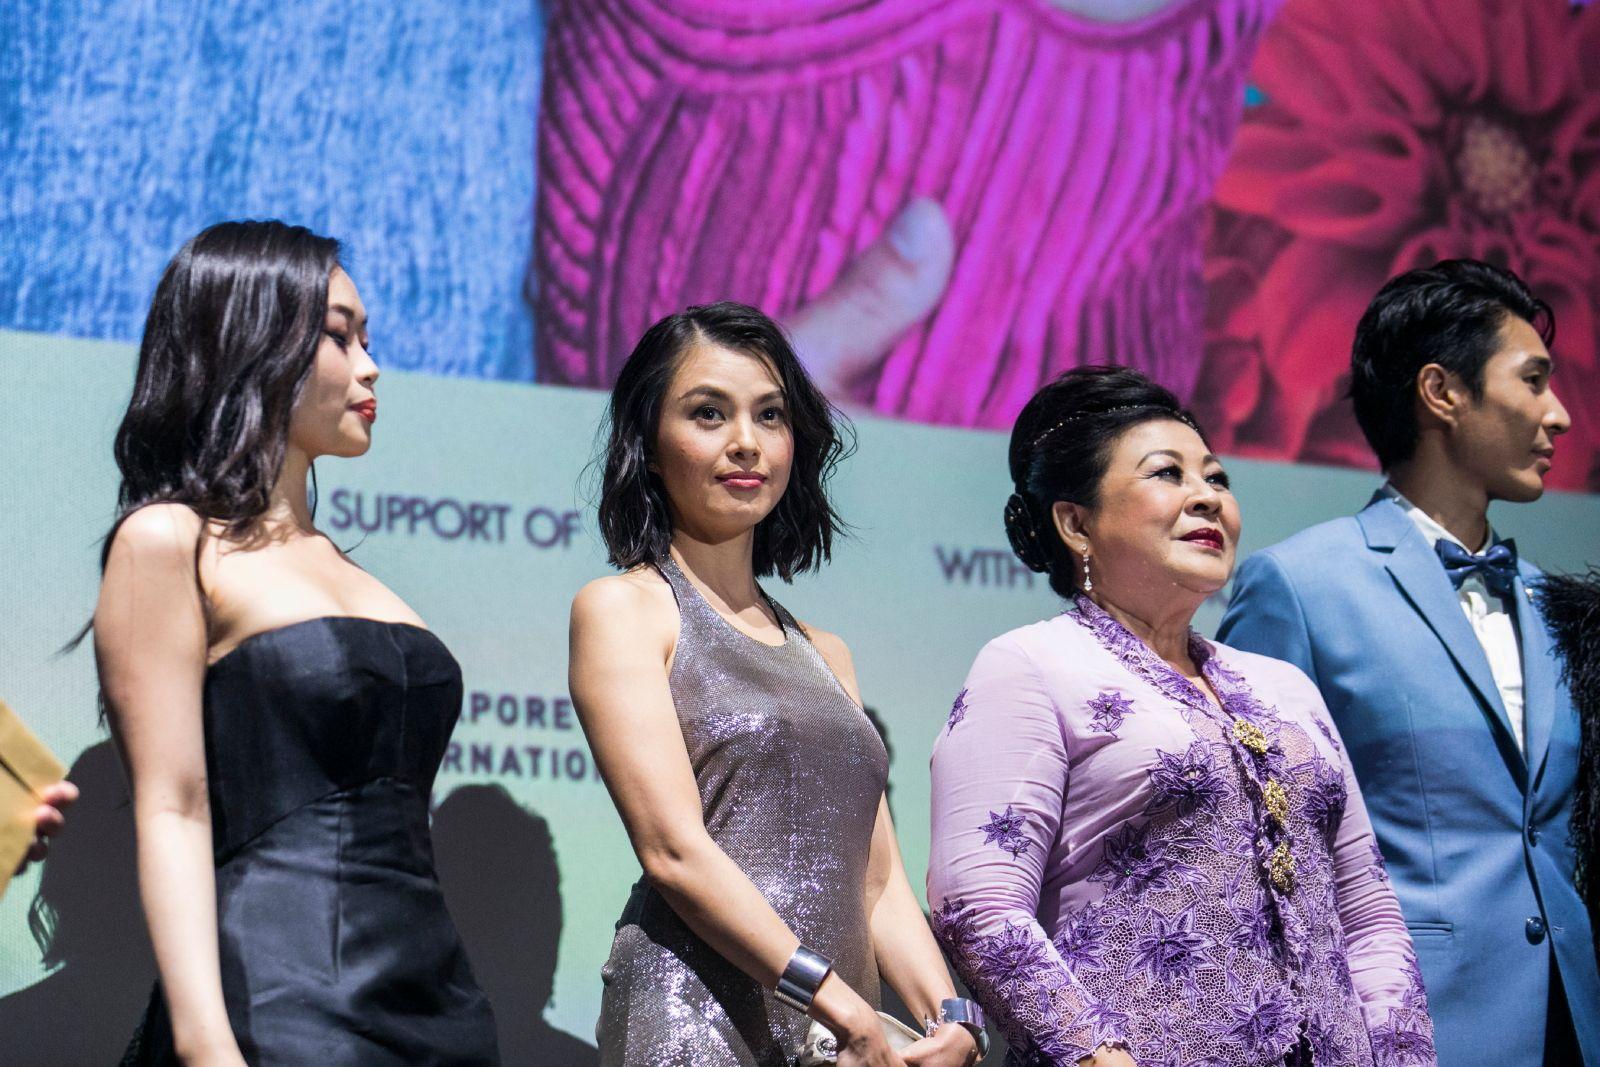 Victoria Loke, Carmen Soo, Koh Chieng Mun, Chris Pang